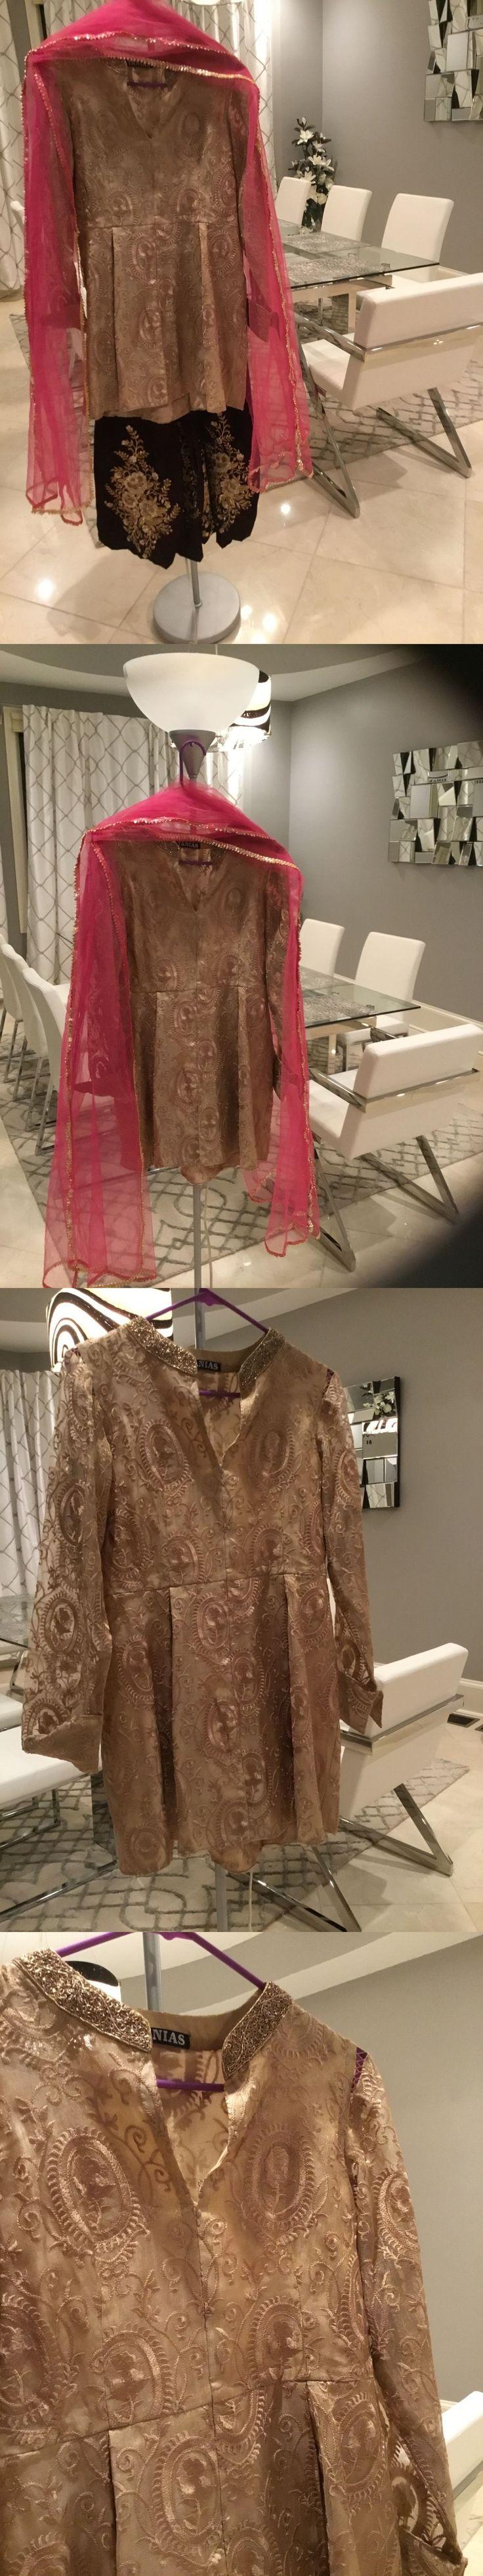 Salwar Kameez 155249: Pakistani Indian Shalwar Kameez Not Asim Jofa Maria B Agha Noor Sana Safinaz Eid -> BUY IT NOW ONLY: $375 on eBay!